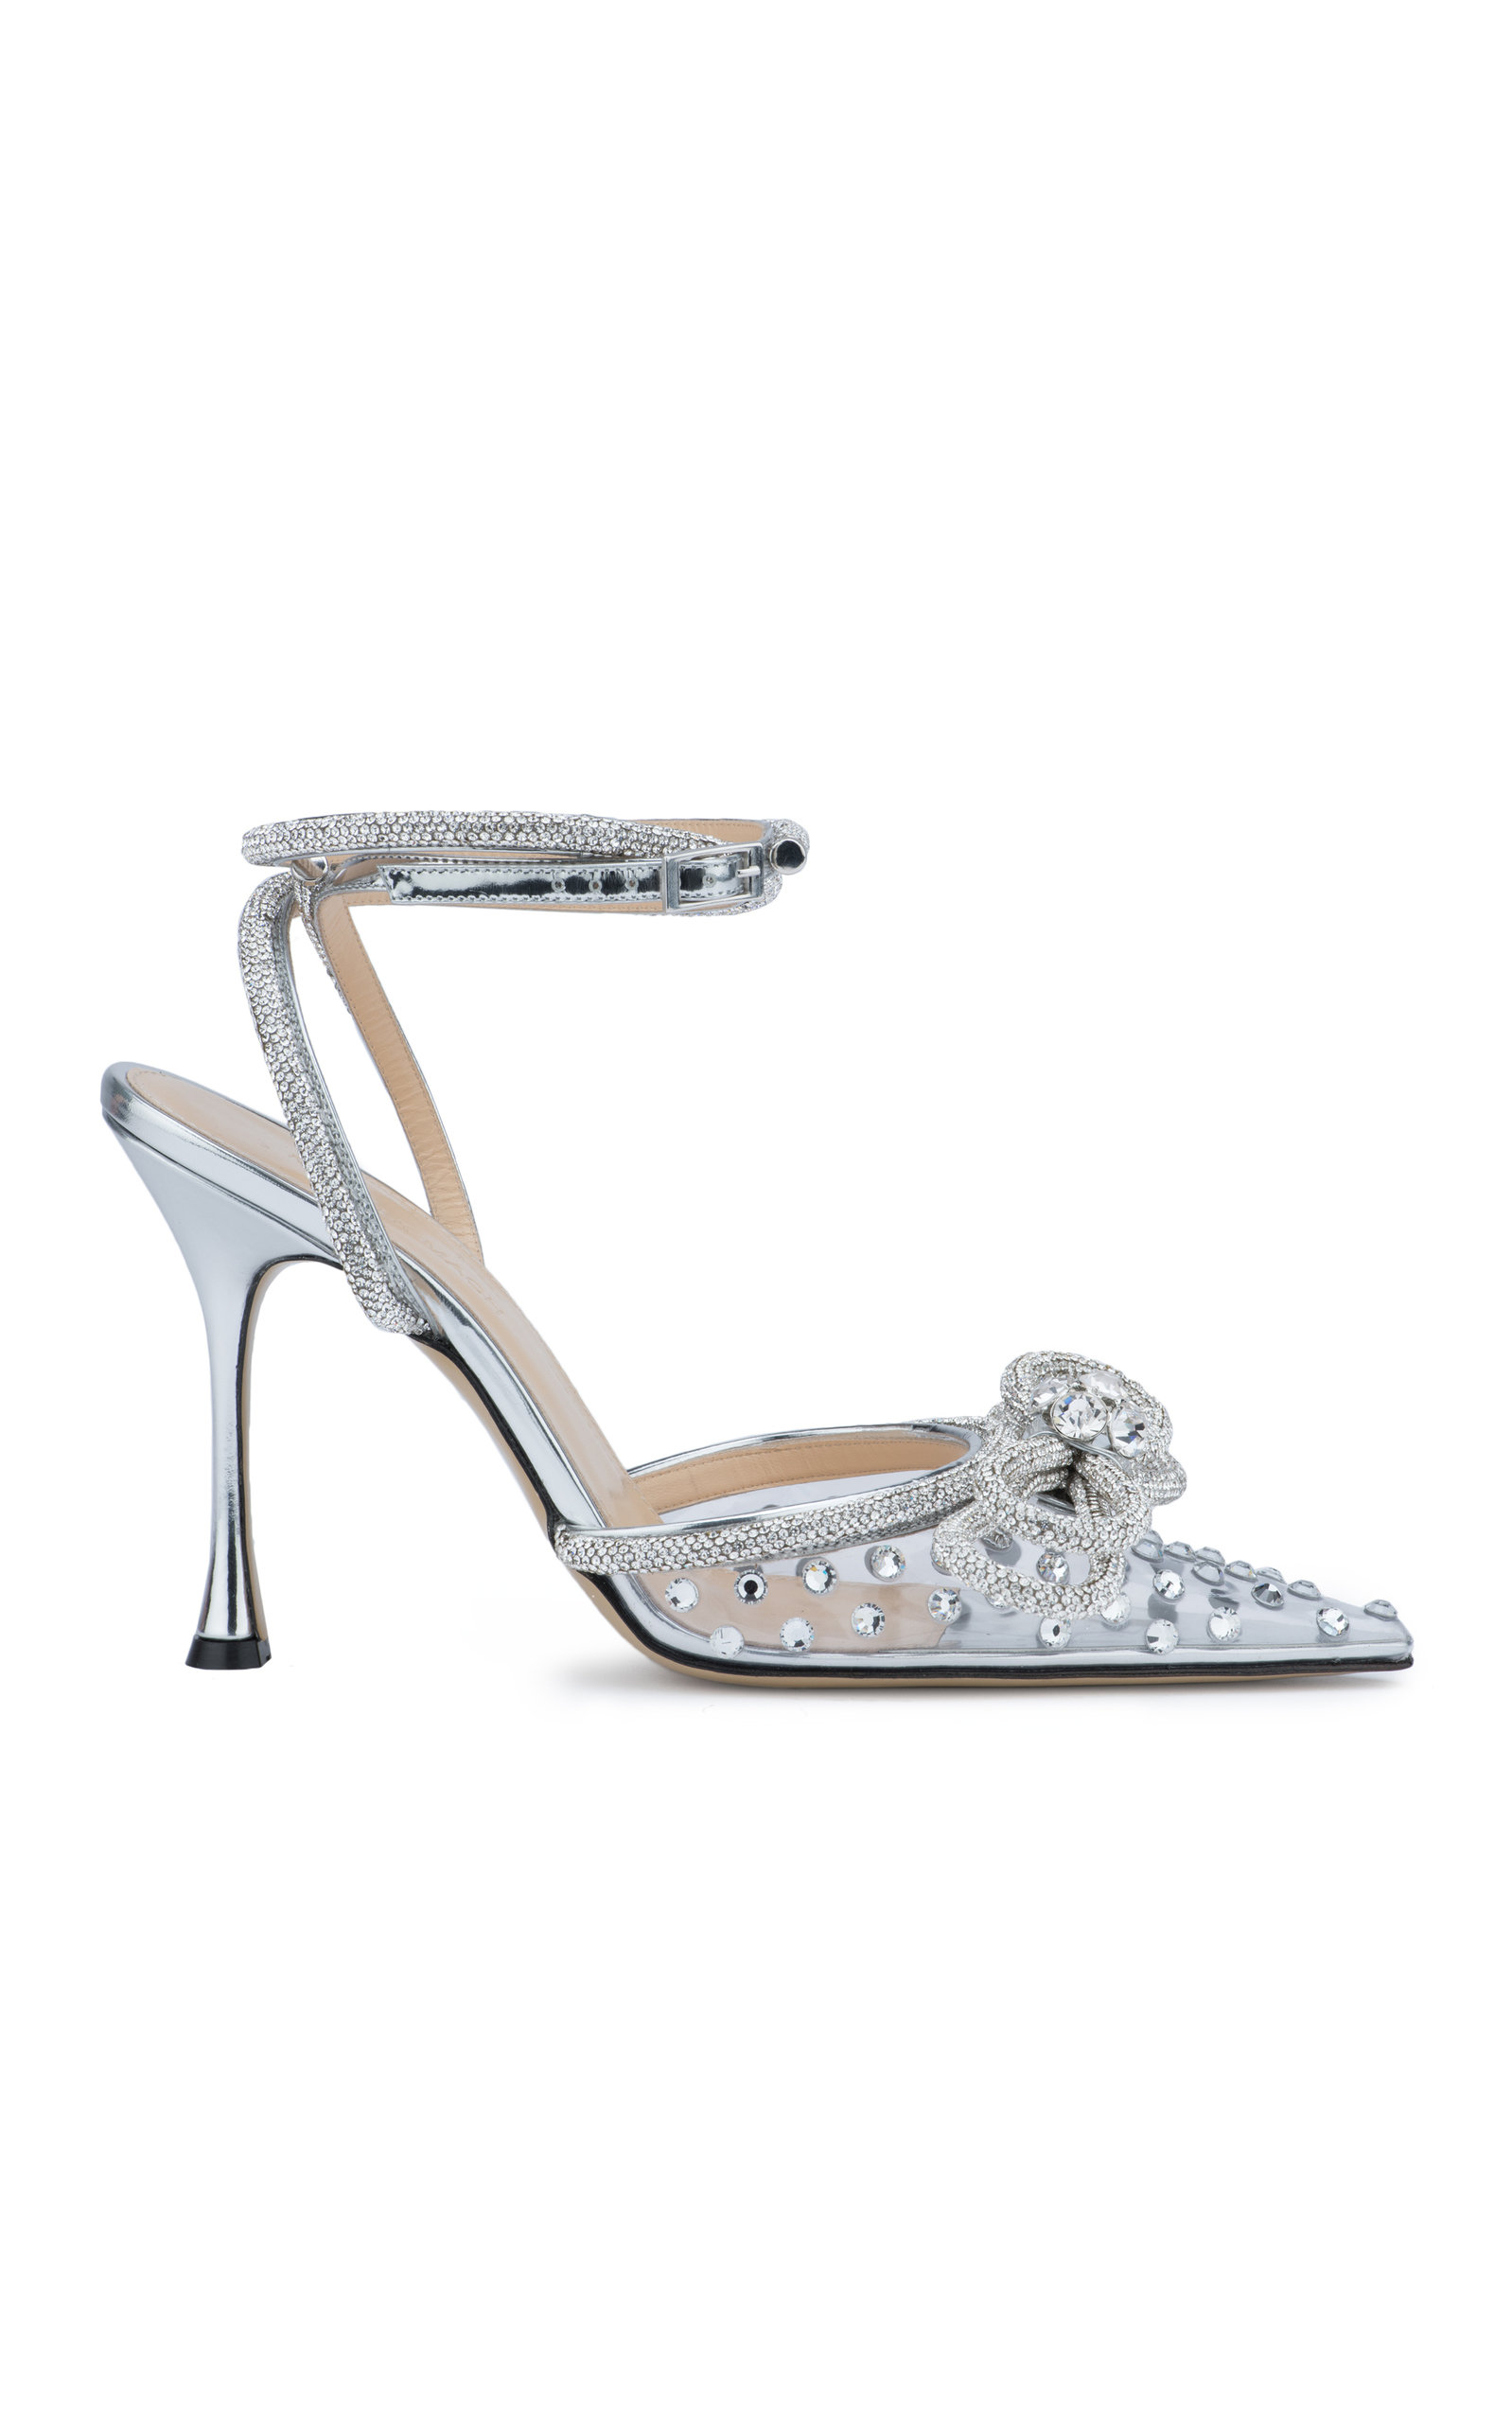 Mach & Mach - Women's Double-Bow Crystal-Embellished PVC Pumps - Silver - Moda Operandi